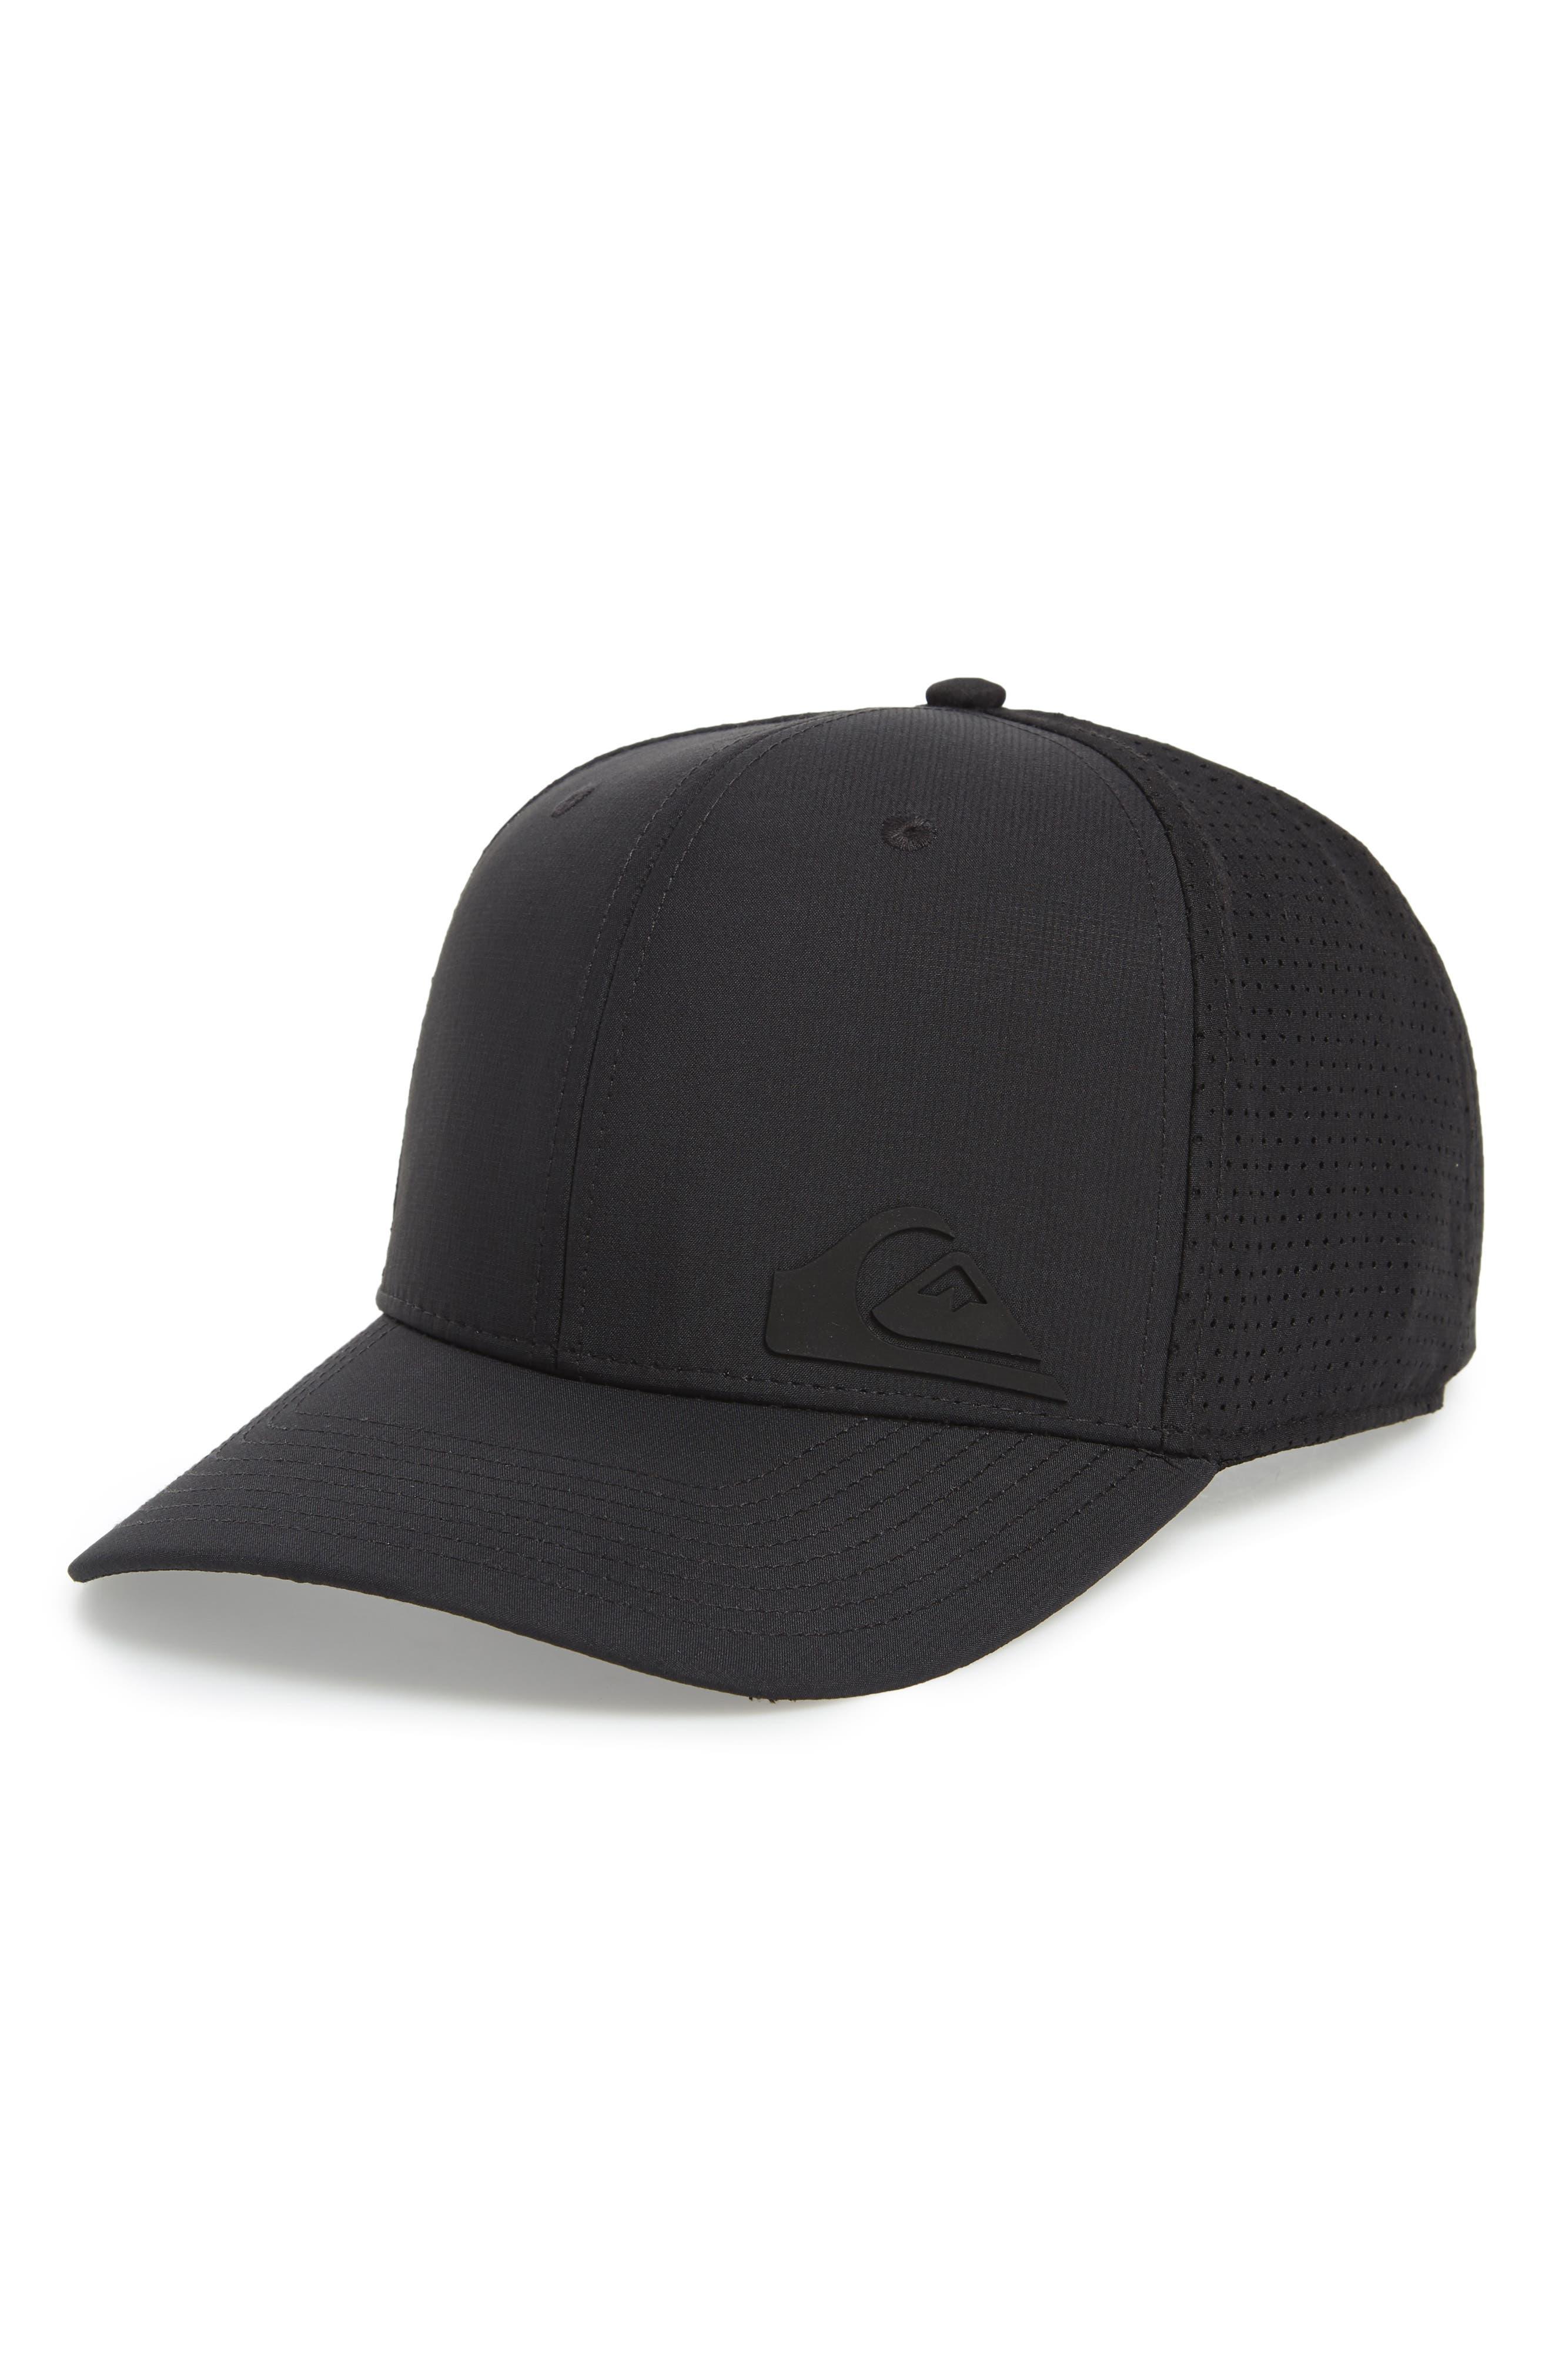 Technabutter 2 Baseball Cap,                             Main thumbnail 1, color,                             BLACK